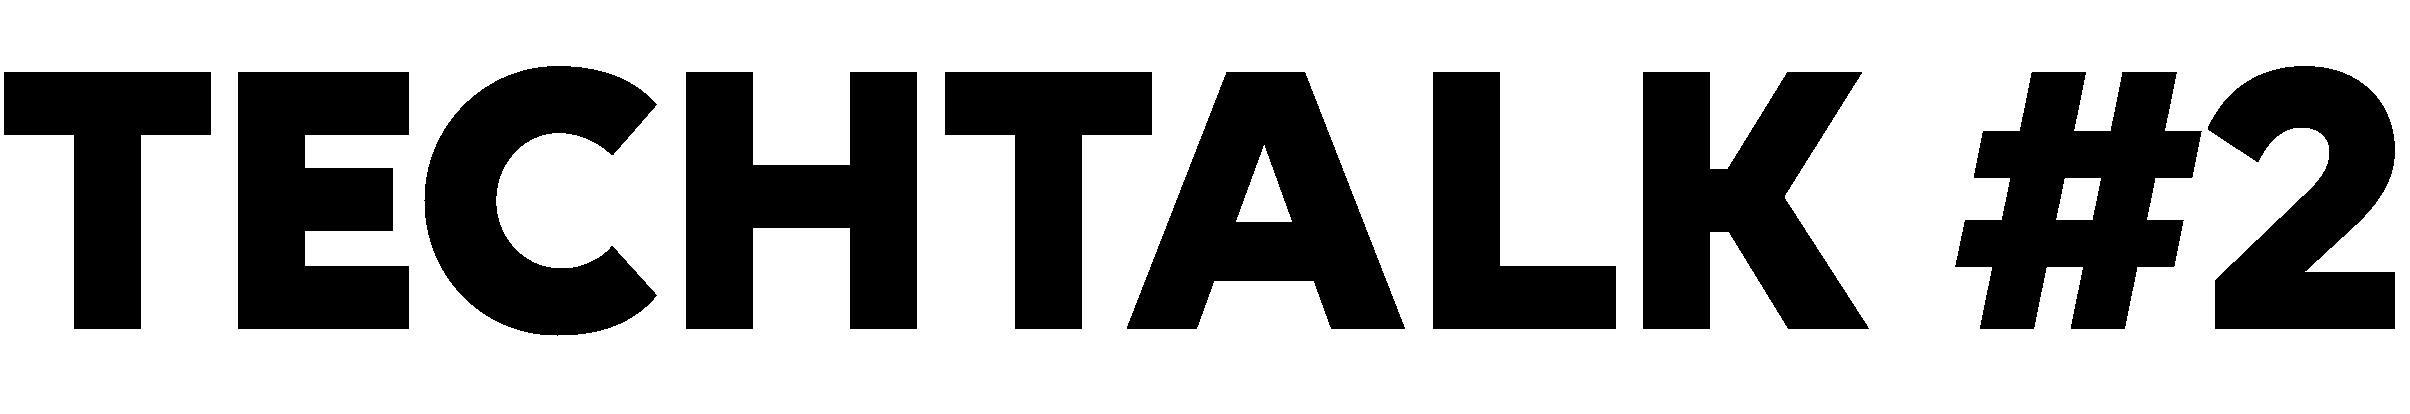 logo techtalk